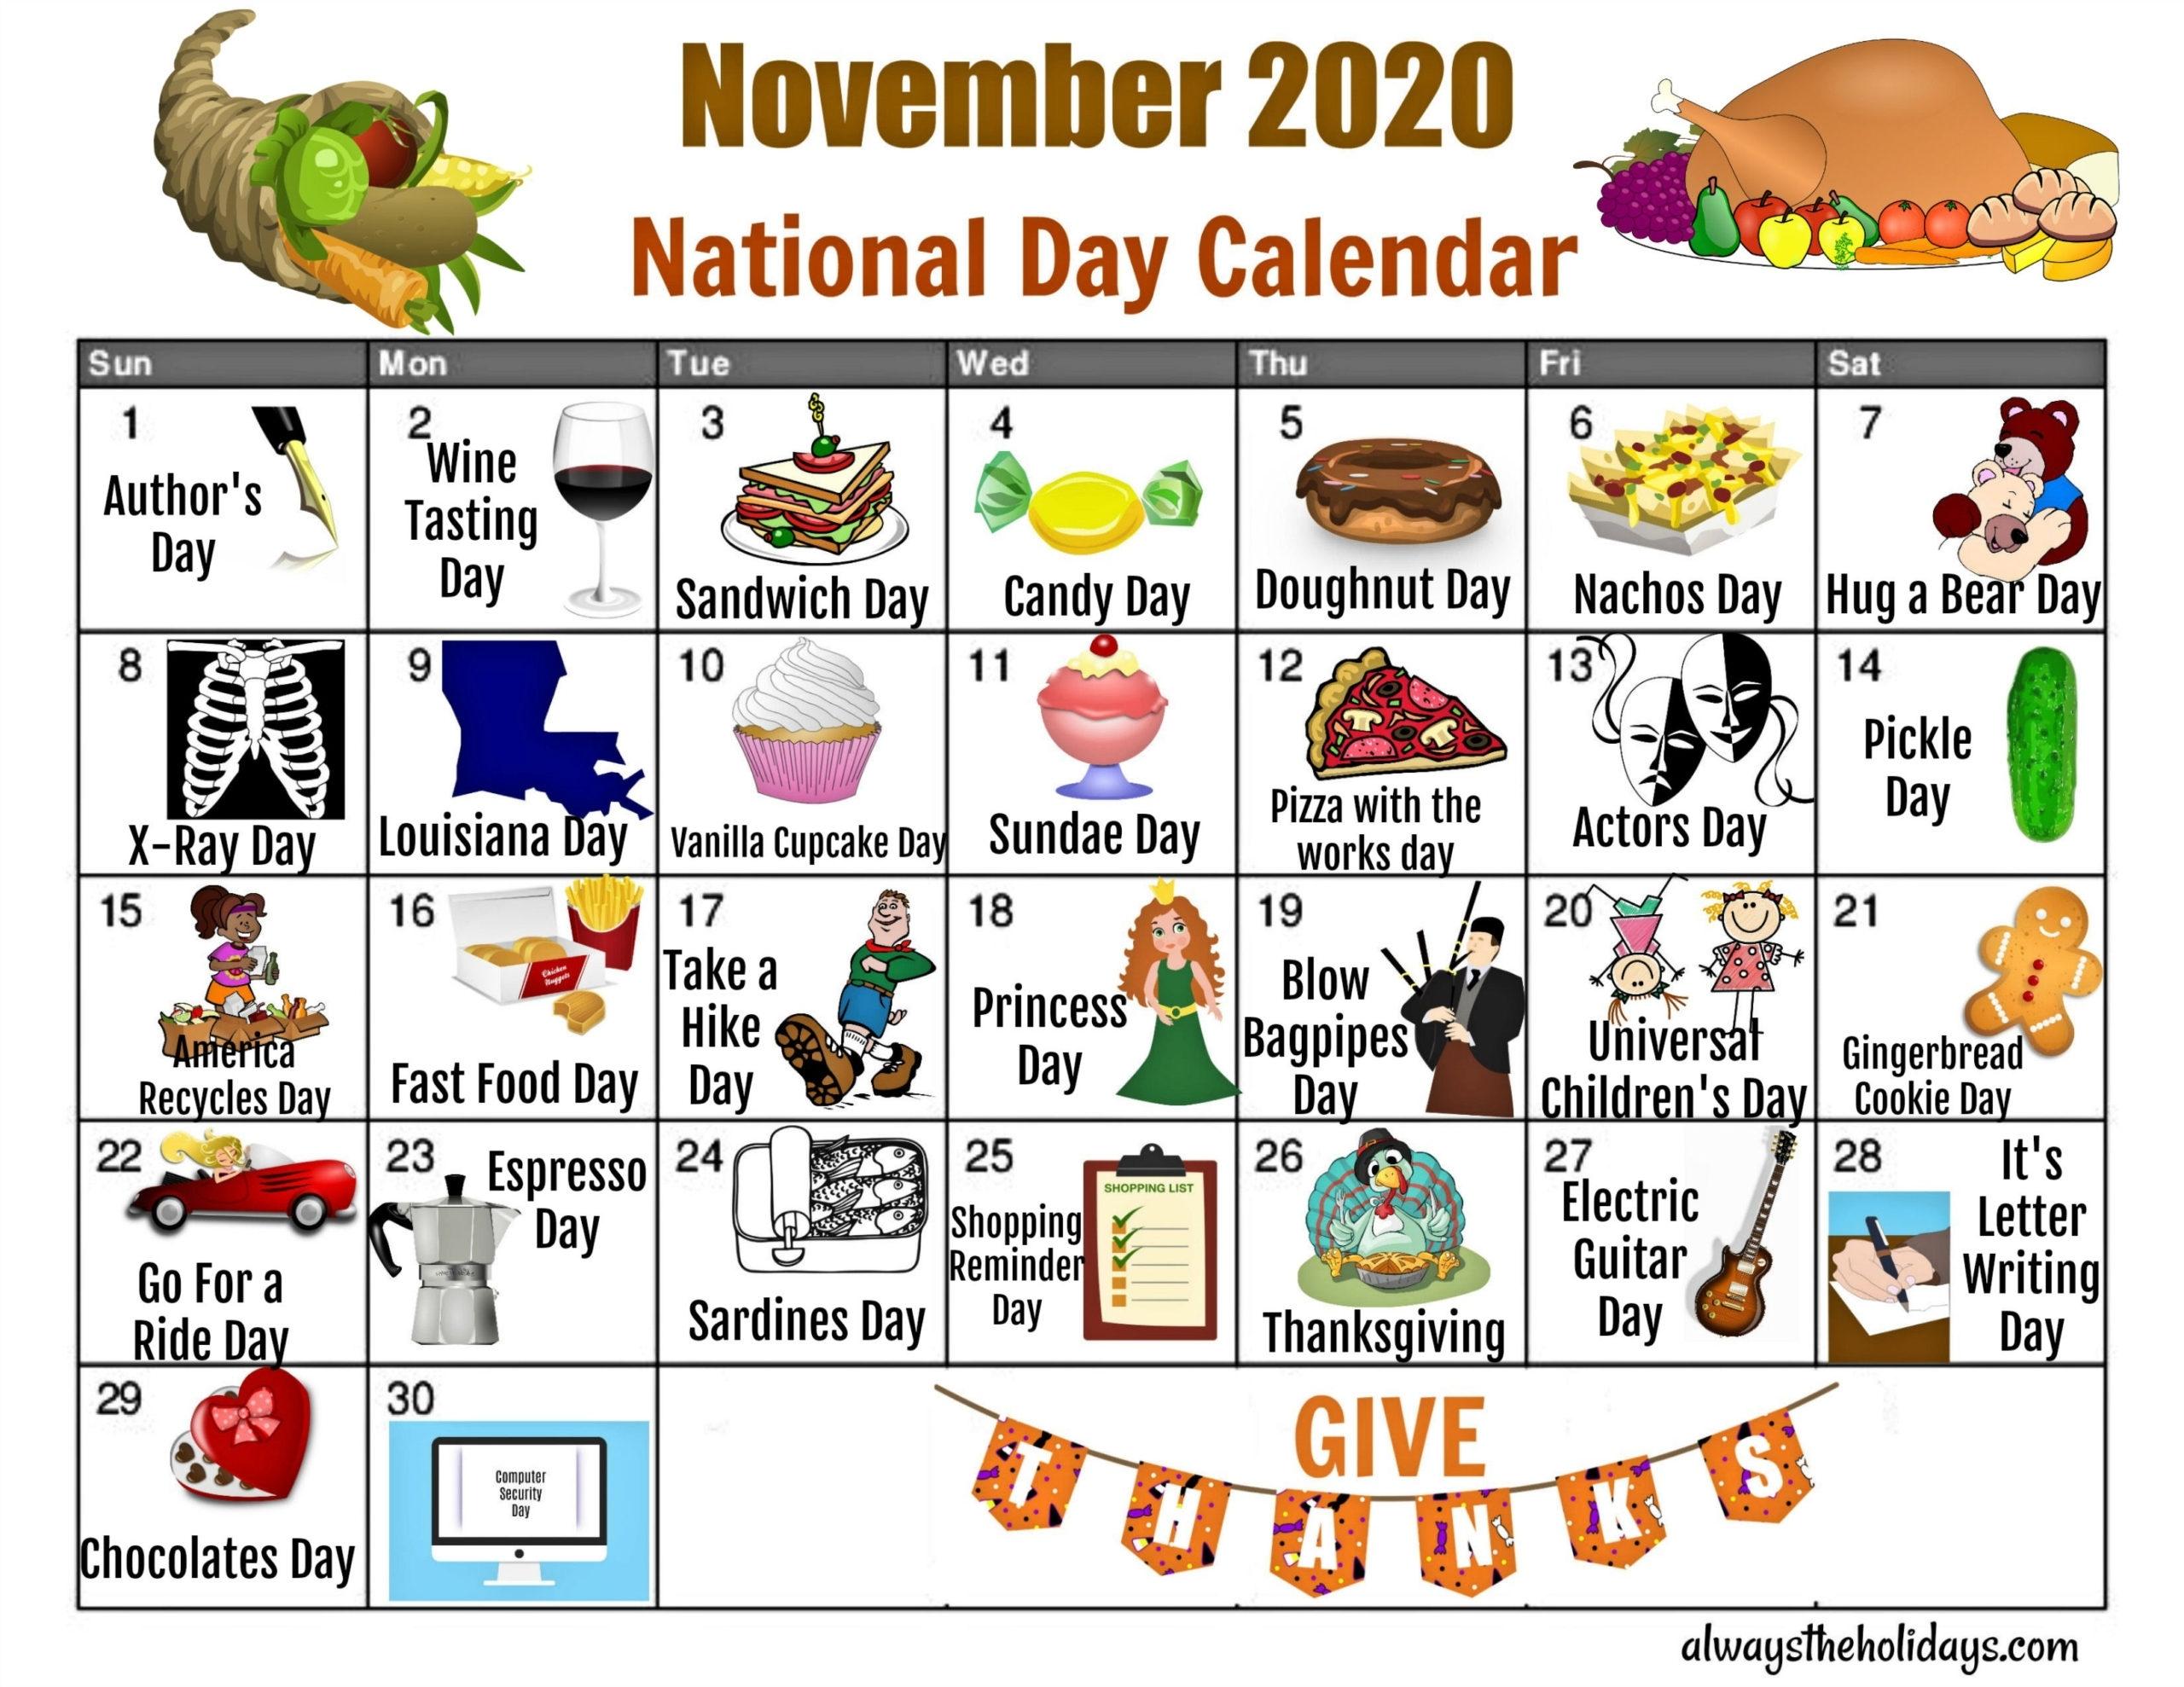 November National Day Calendar - Free Printable Calendars regarding Free Priintable Calendar Day By Day